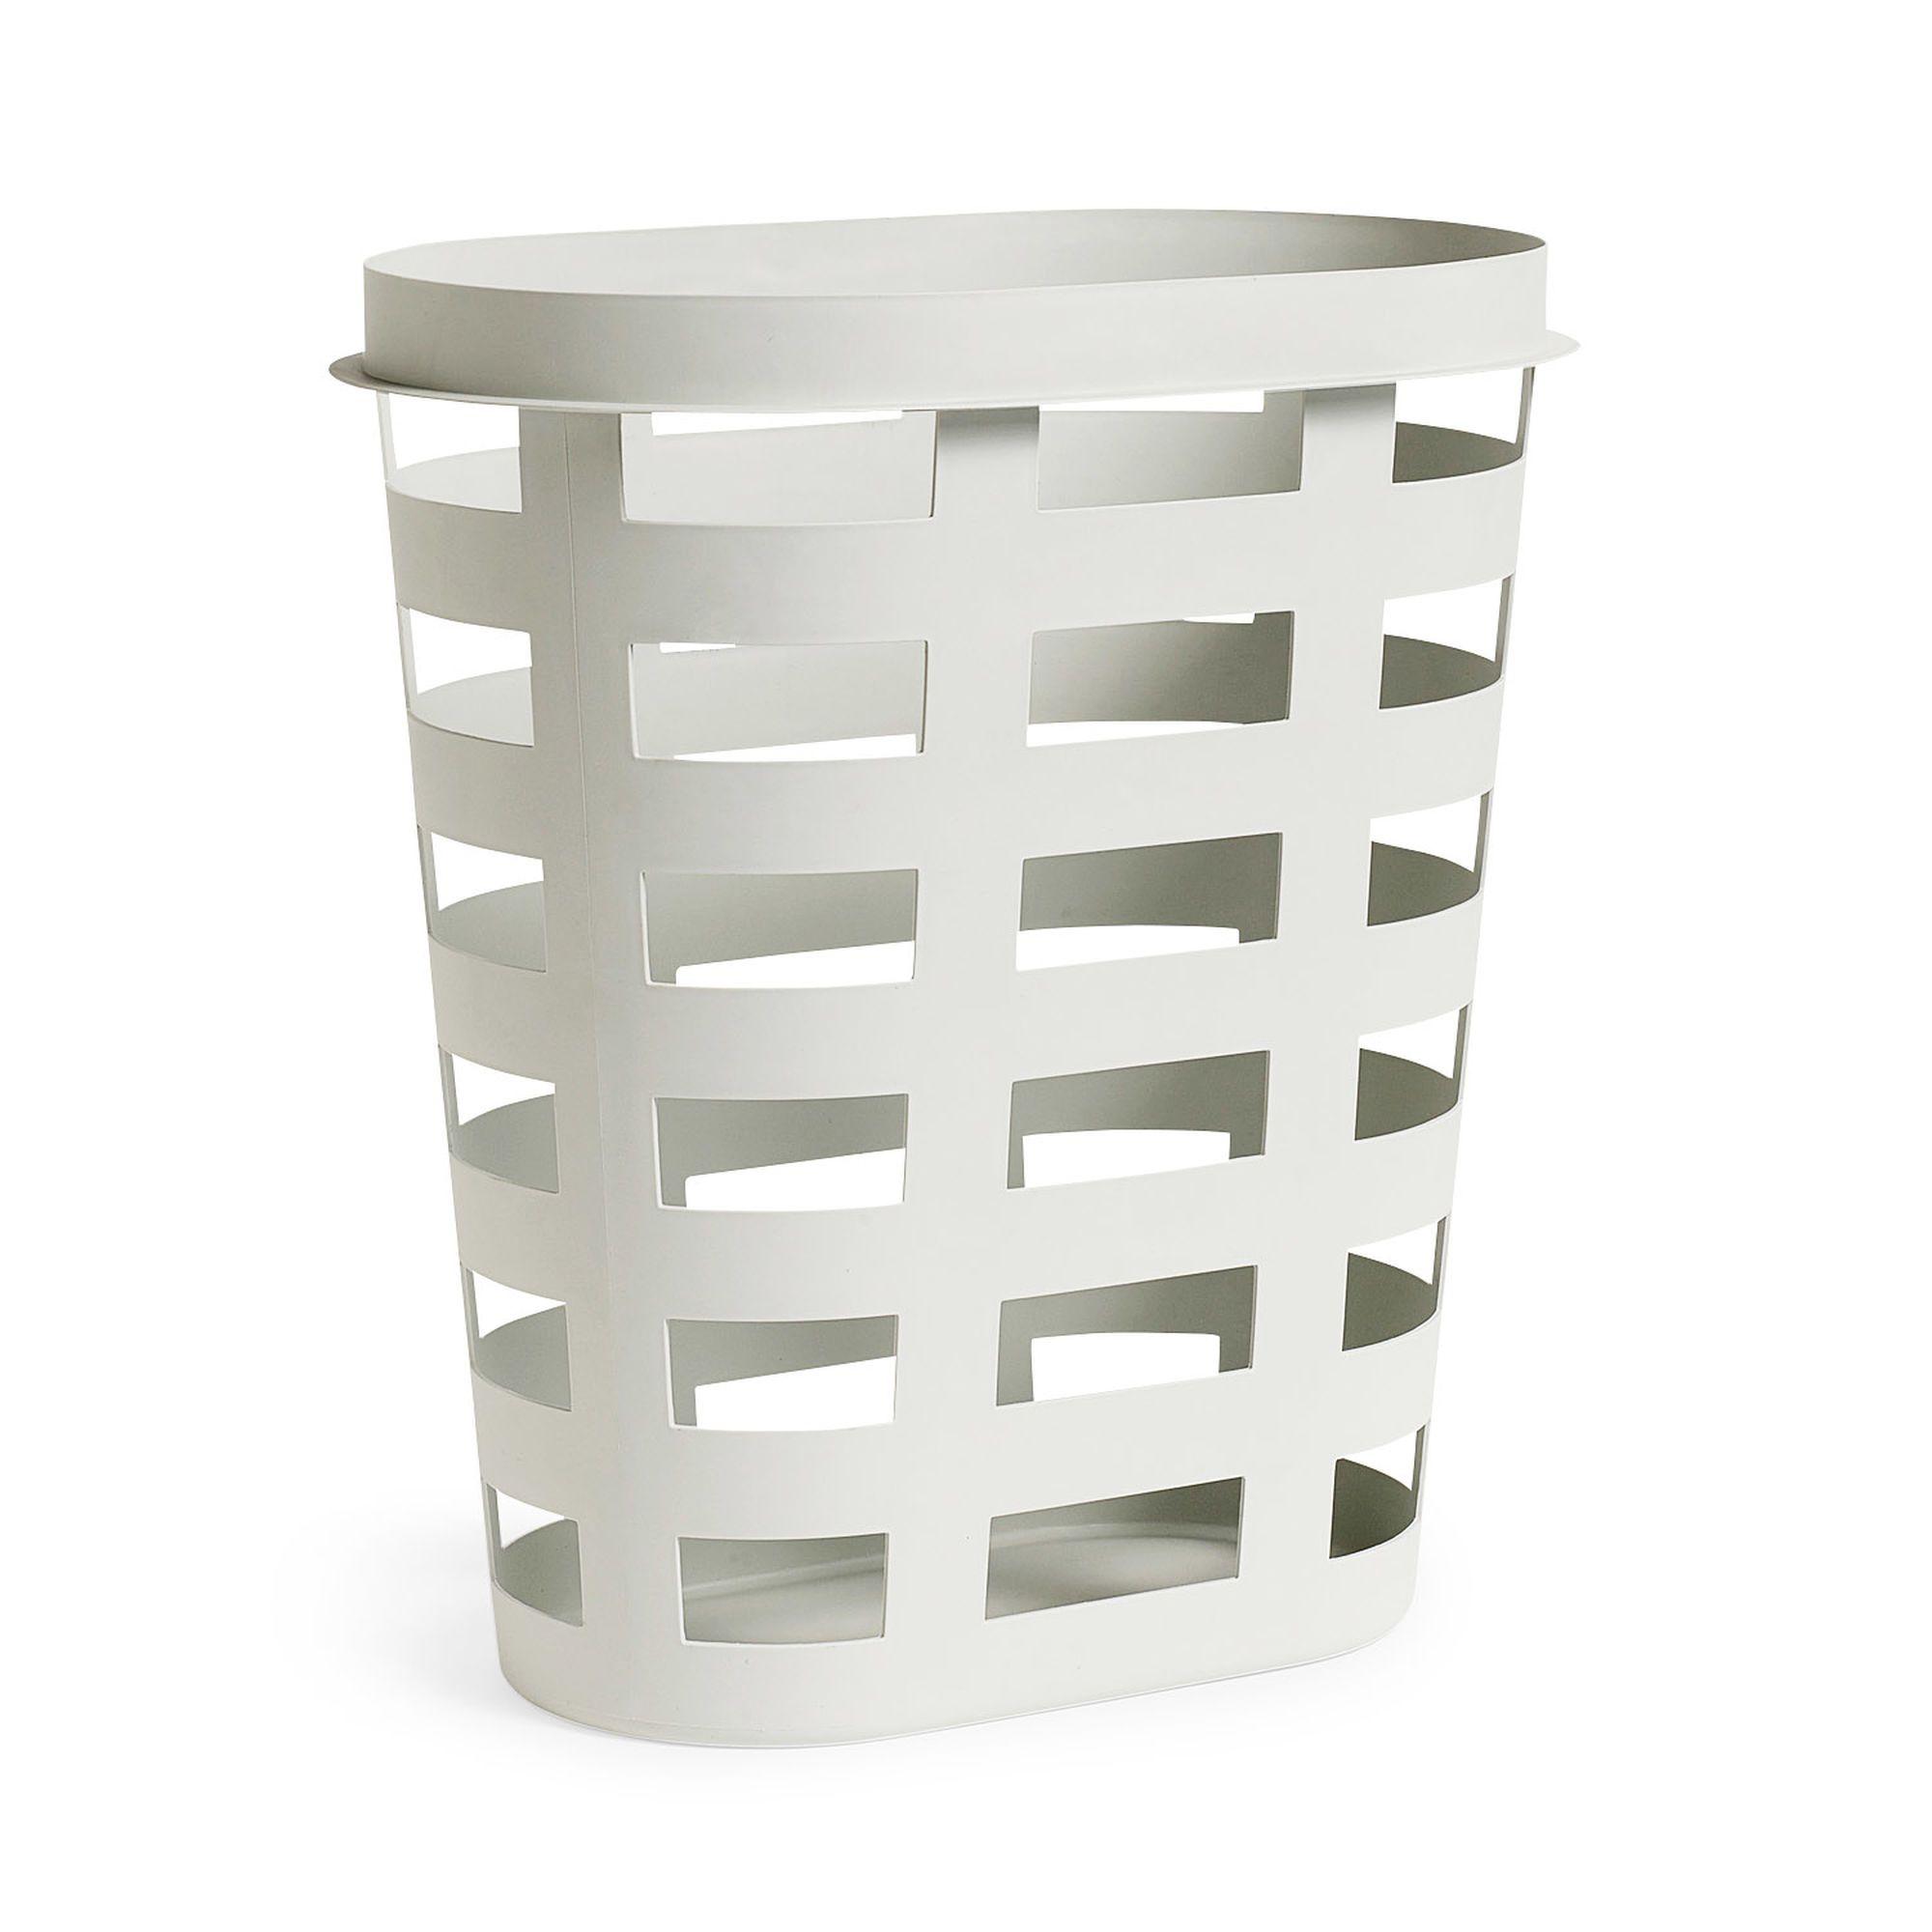 Hay Laundry Basket In Color Grey Laundry Basket Basket Lighting